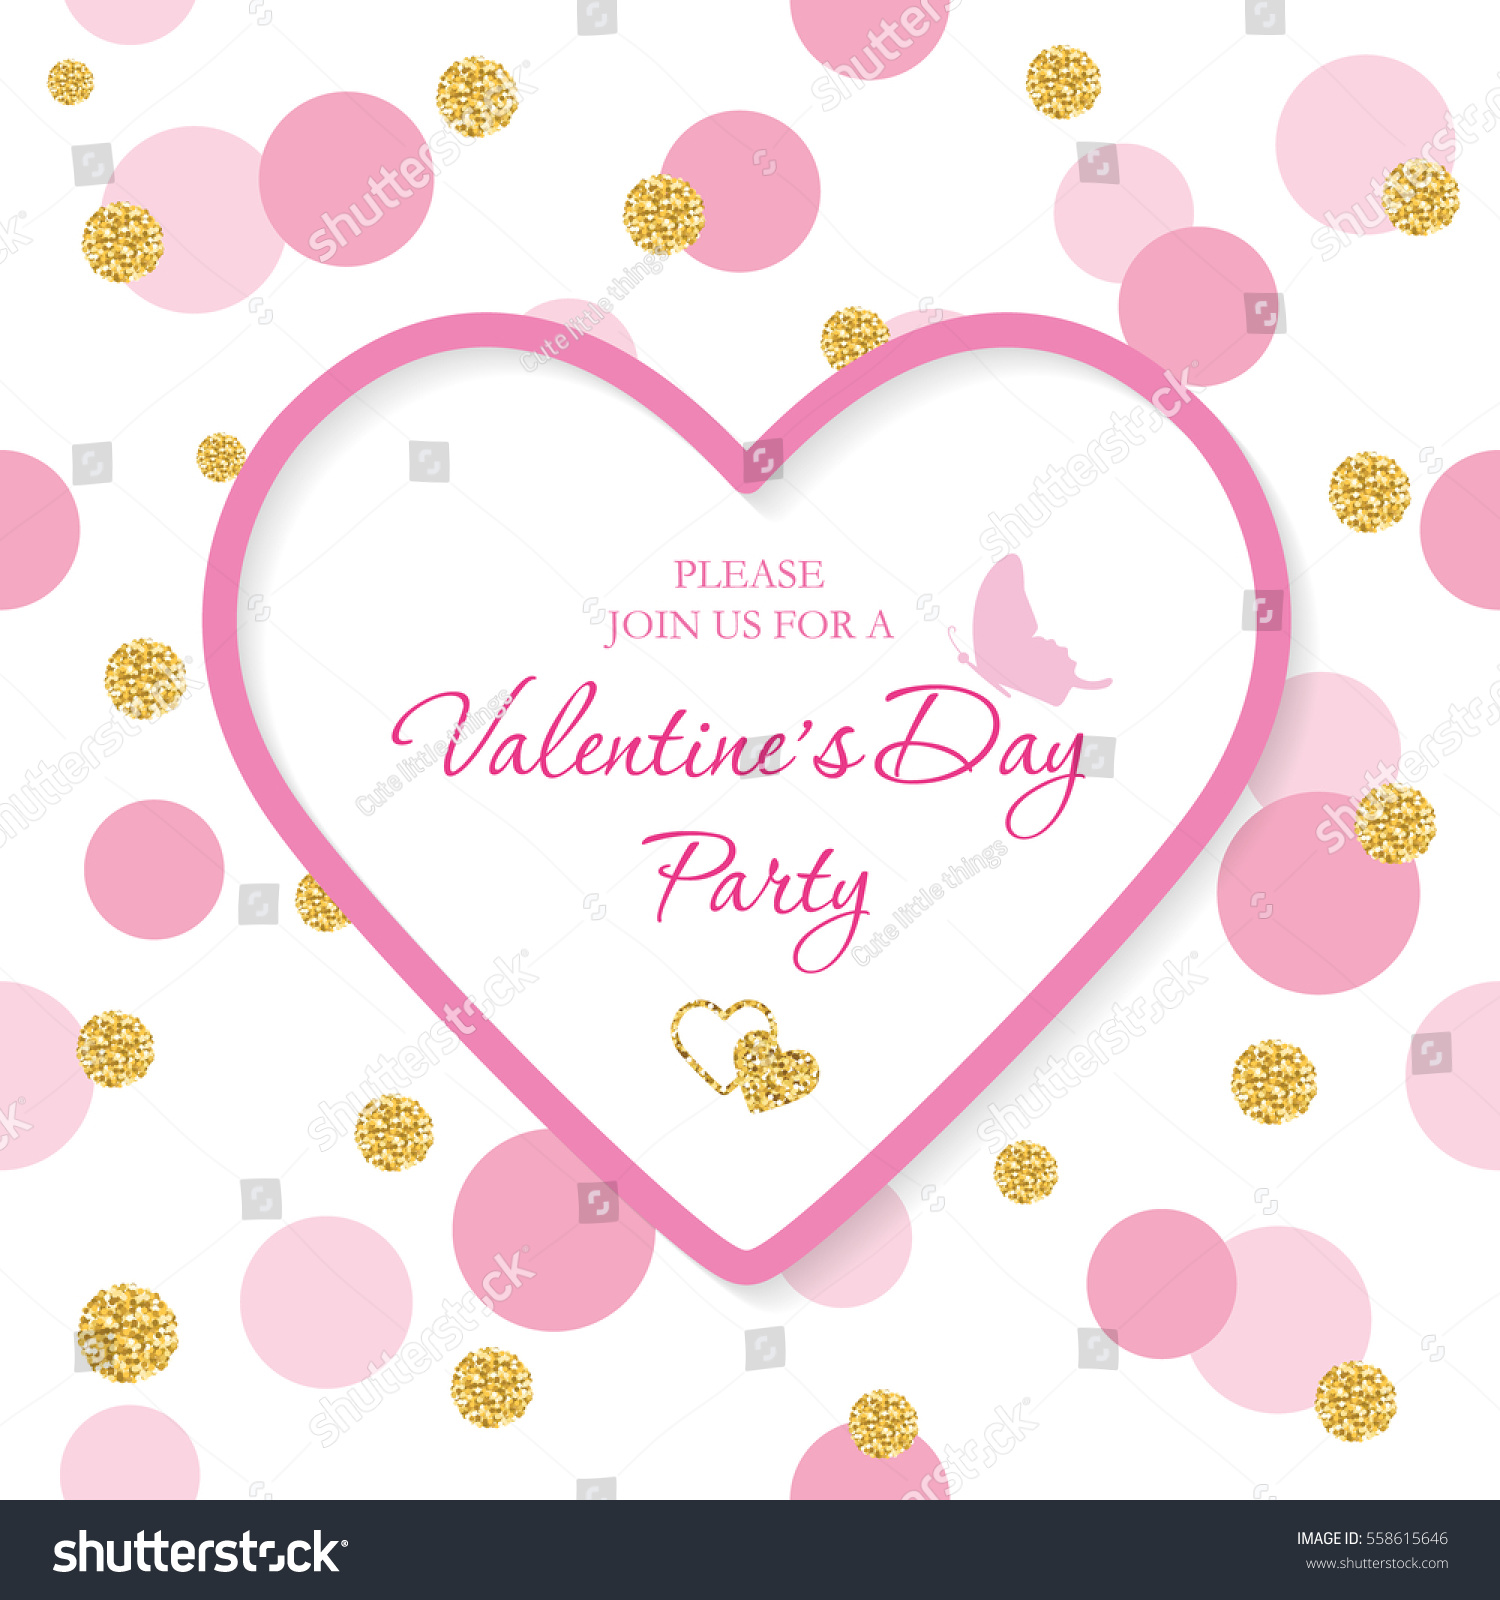 valentines day invitation template included laser stock vector 558615646 shutterstock. Black Bedroom Furniture Sets. Home Design Ideas